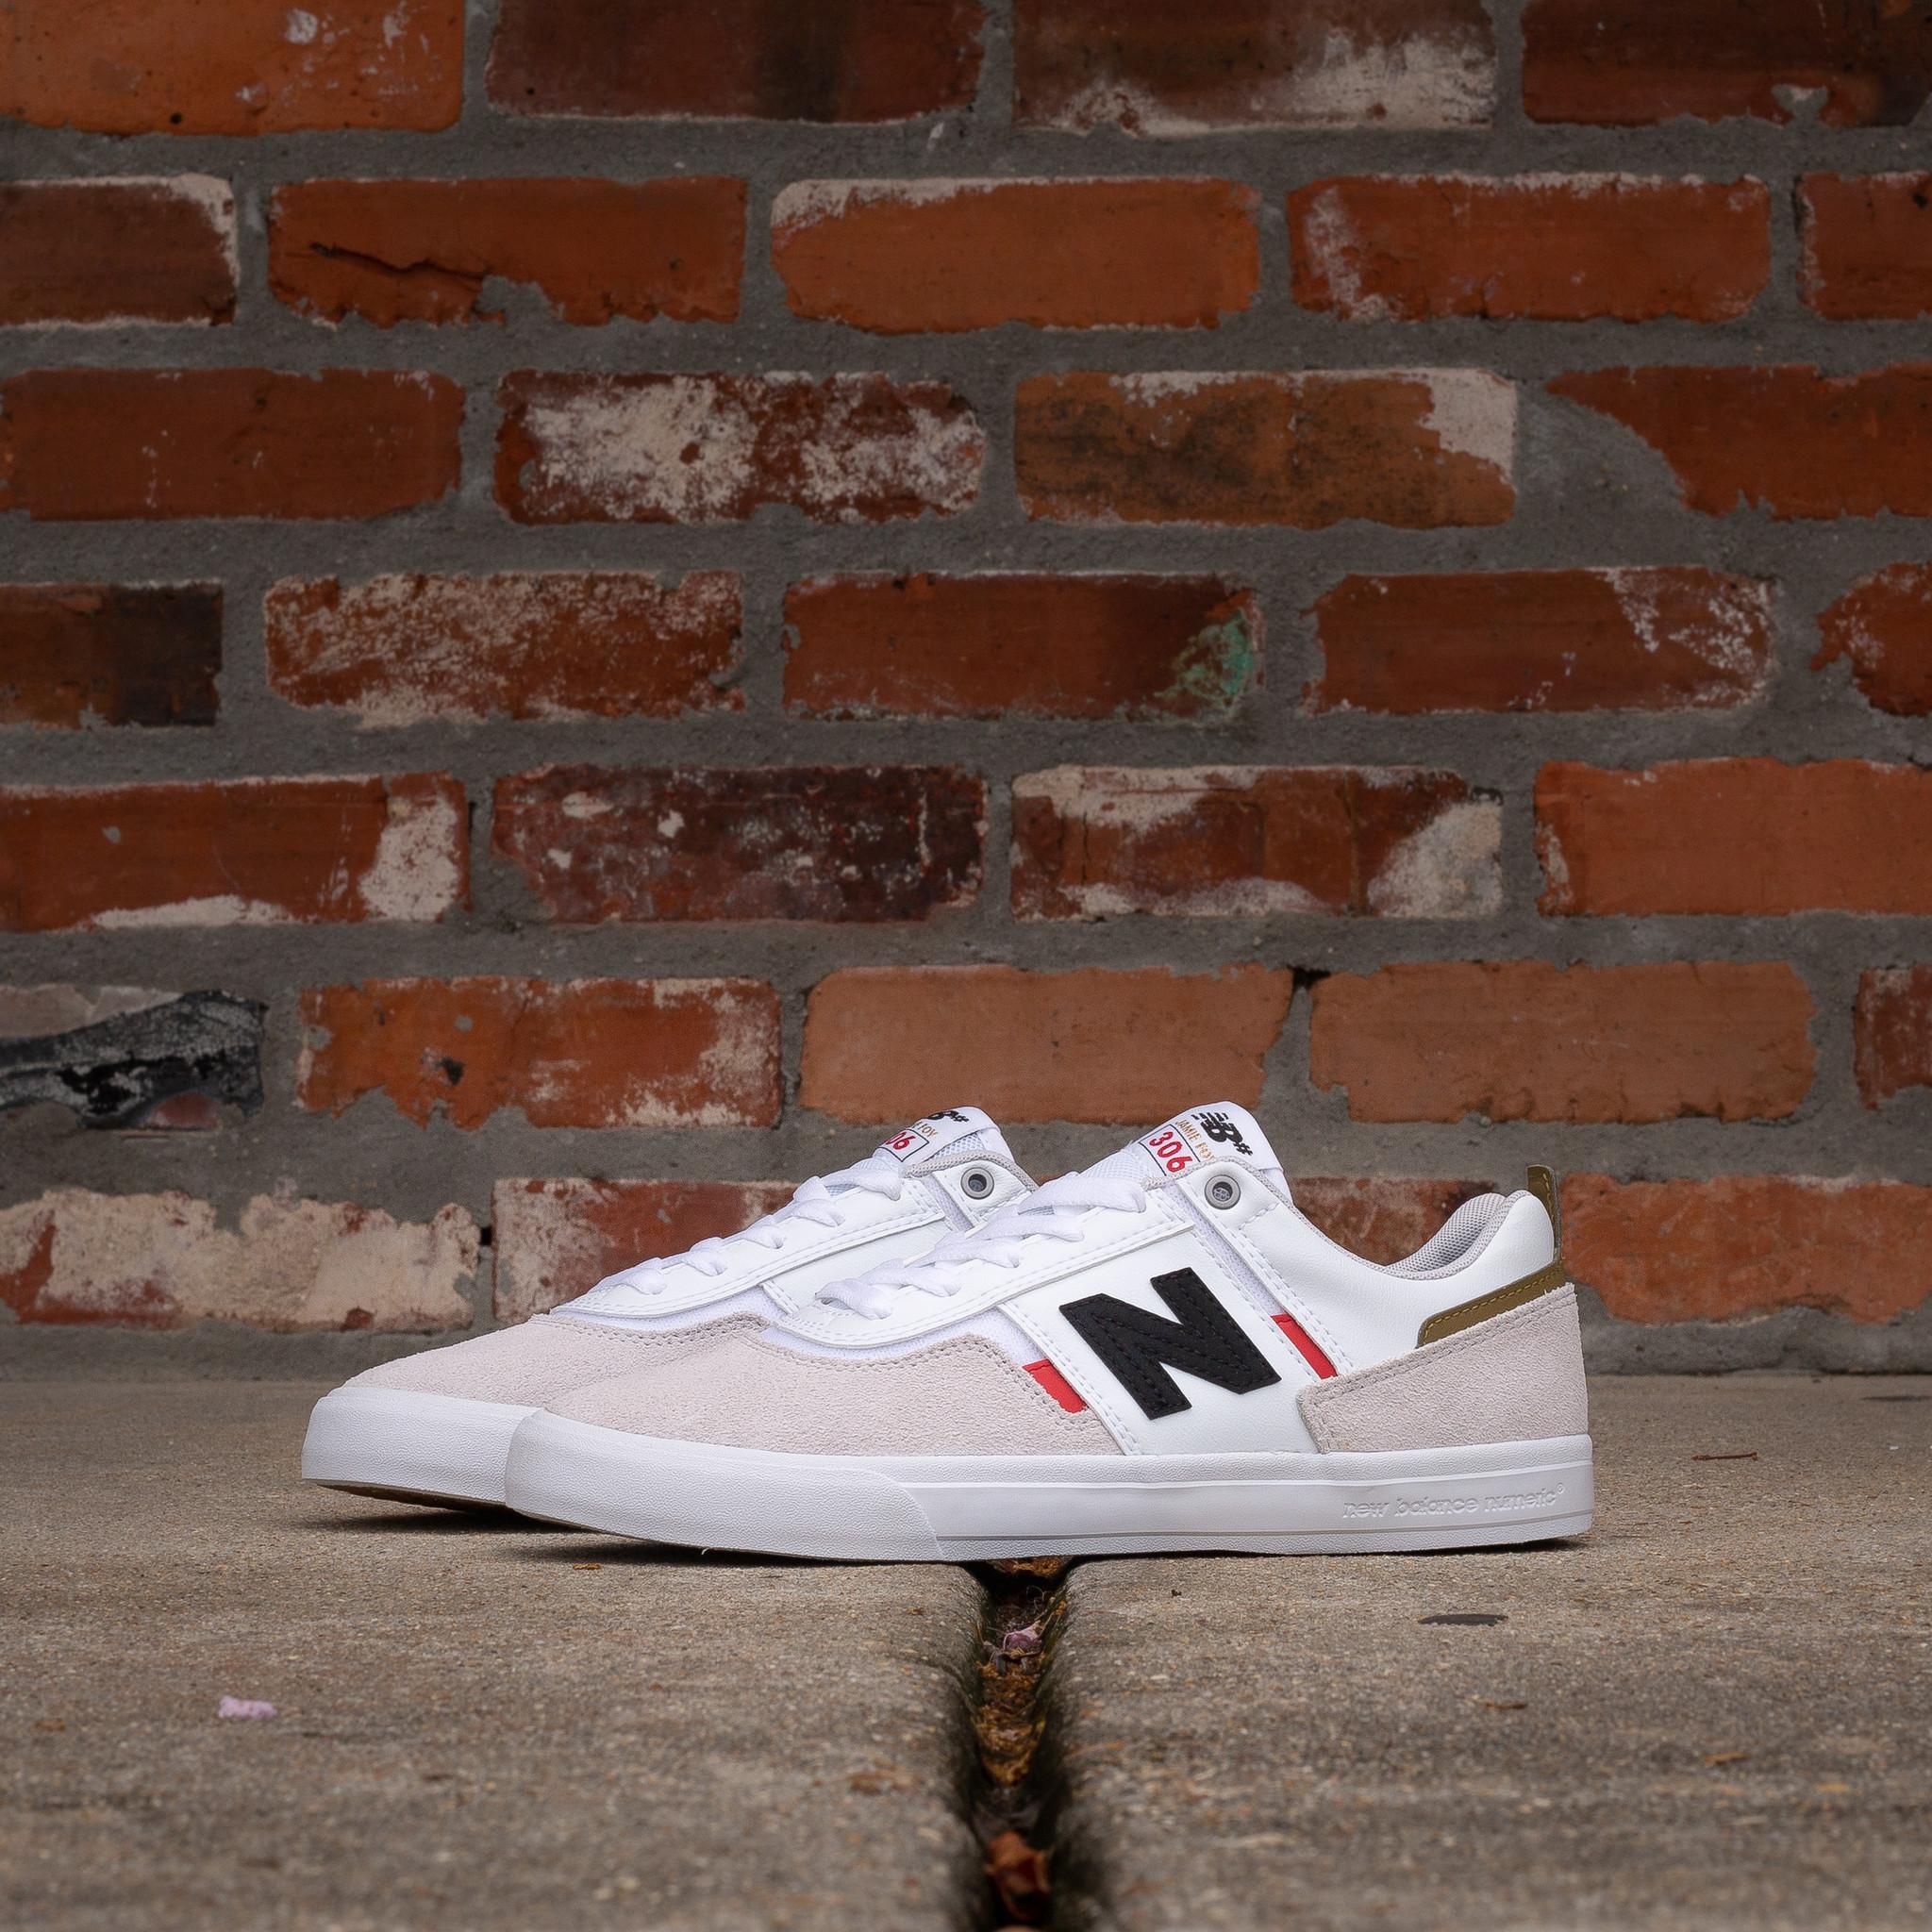 New Balance Jamie Foy 306 white/red